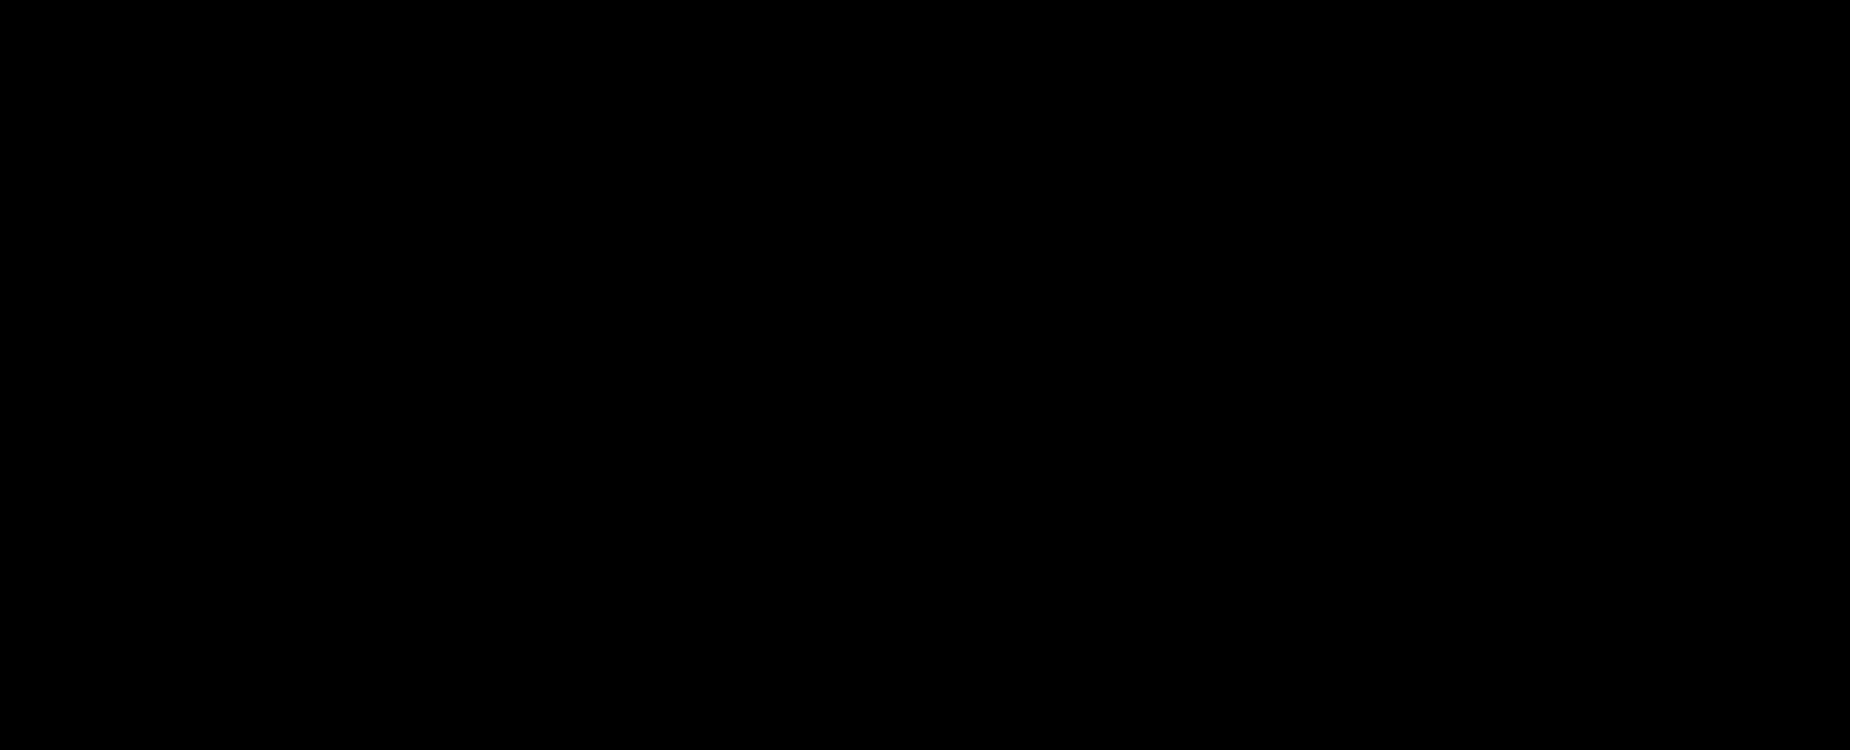 Clipart shark lemon shark. Line art marine biology